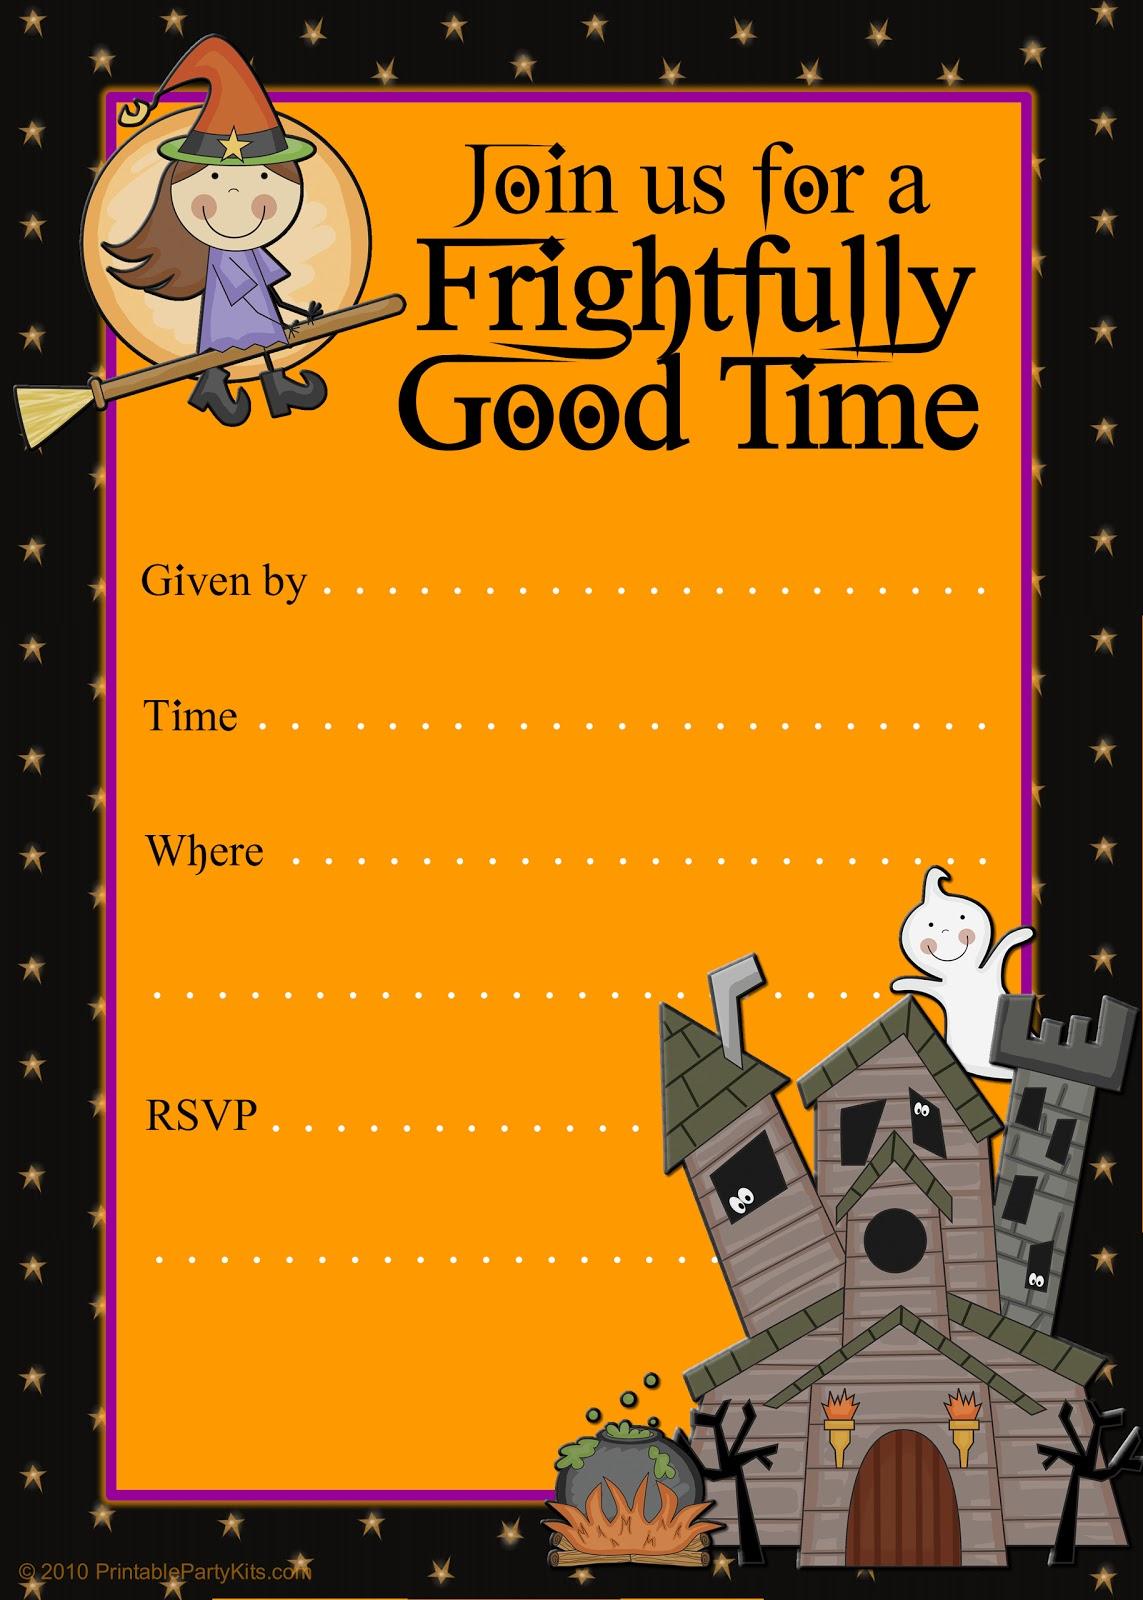 printable halloween party invitation templates mickey mouse halloween templates plain printable halloween party invitation templates almost